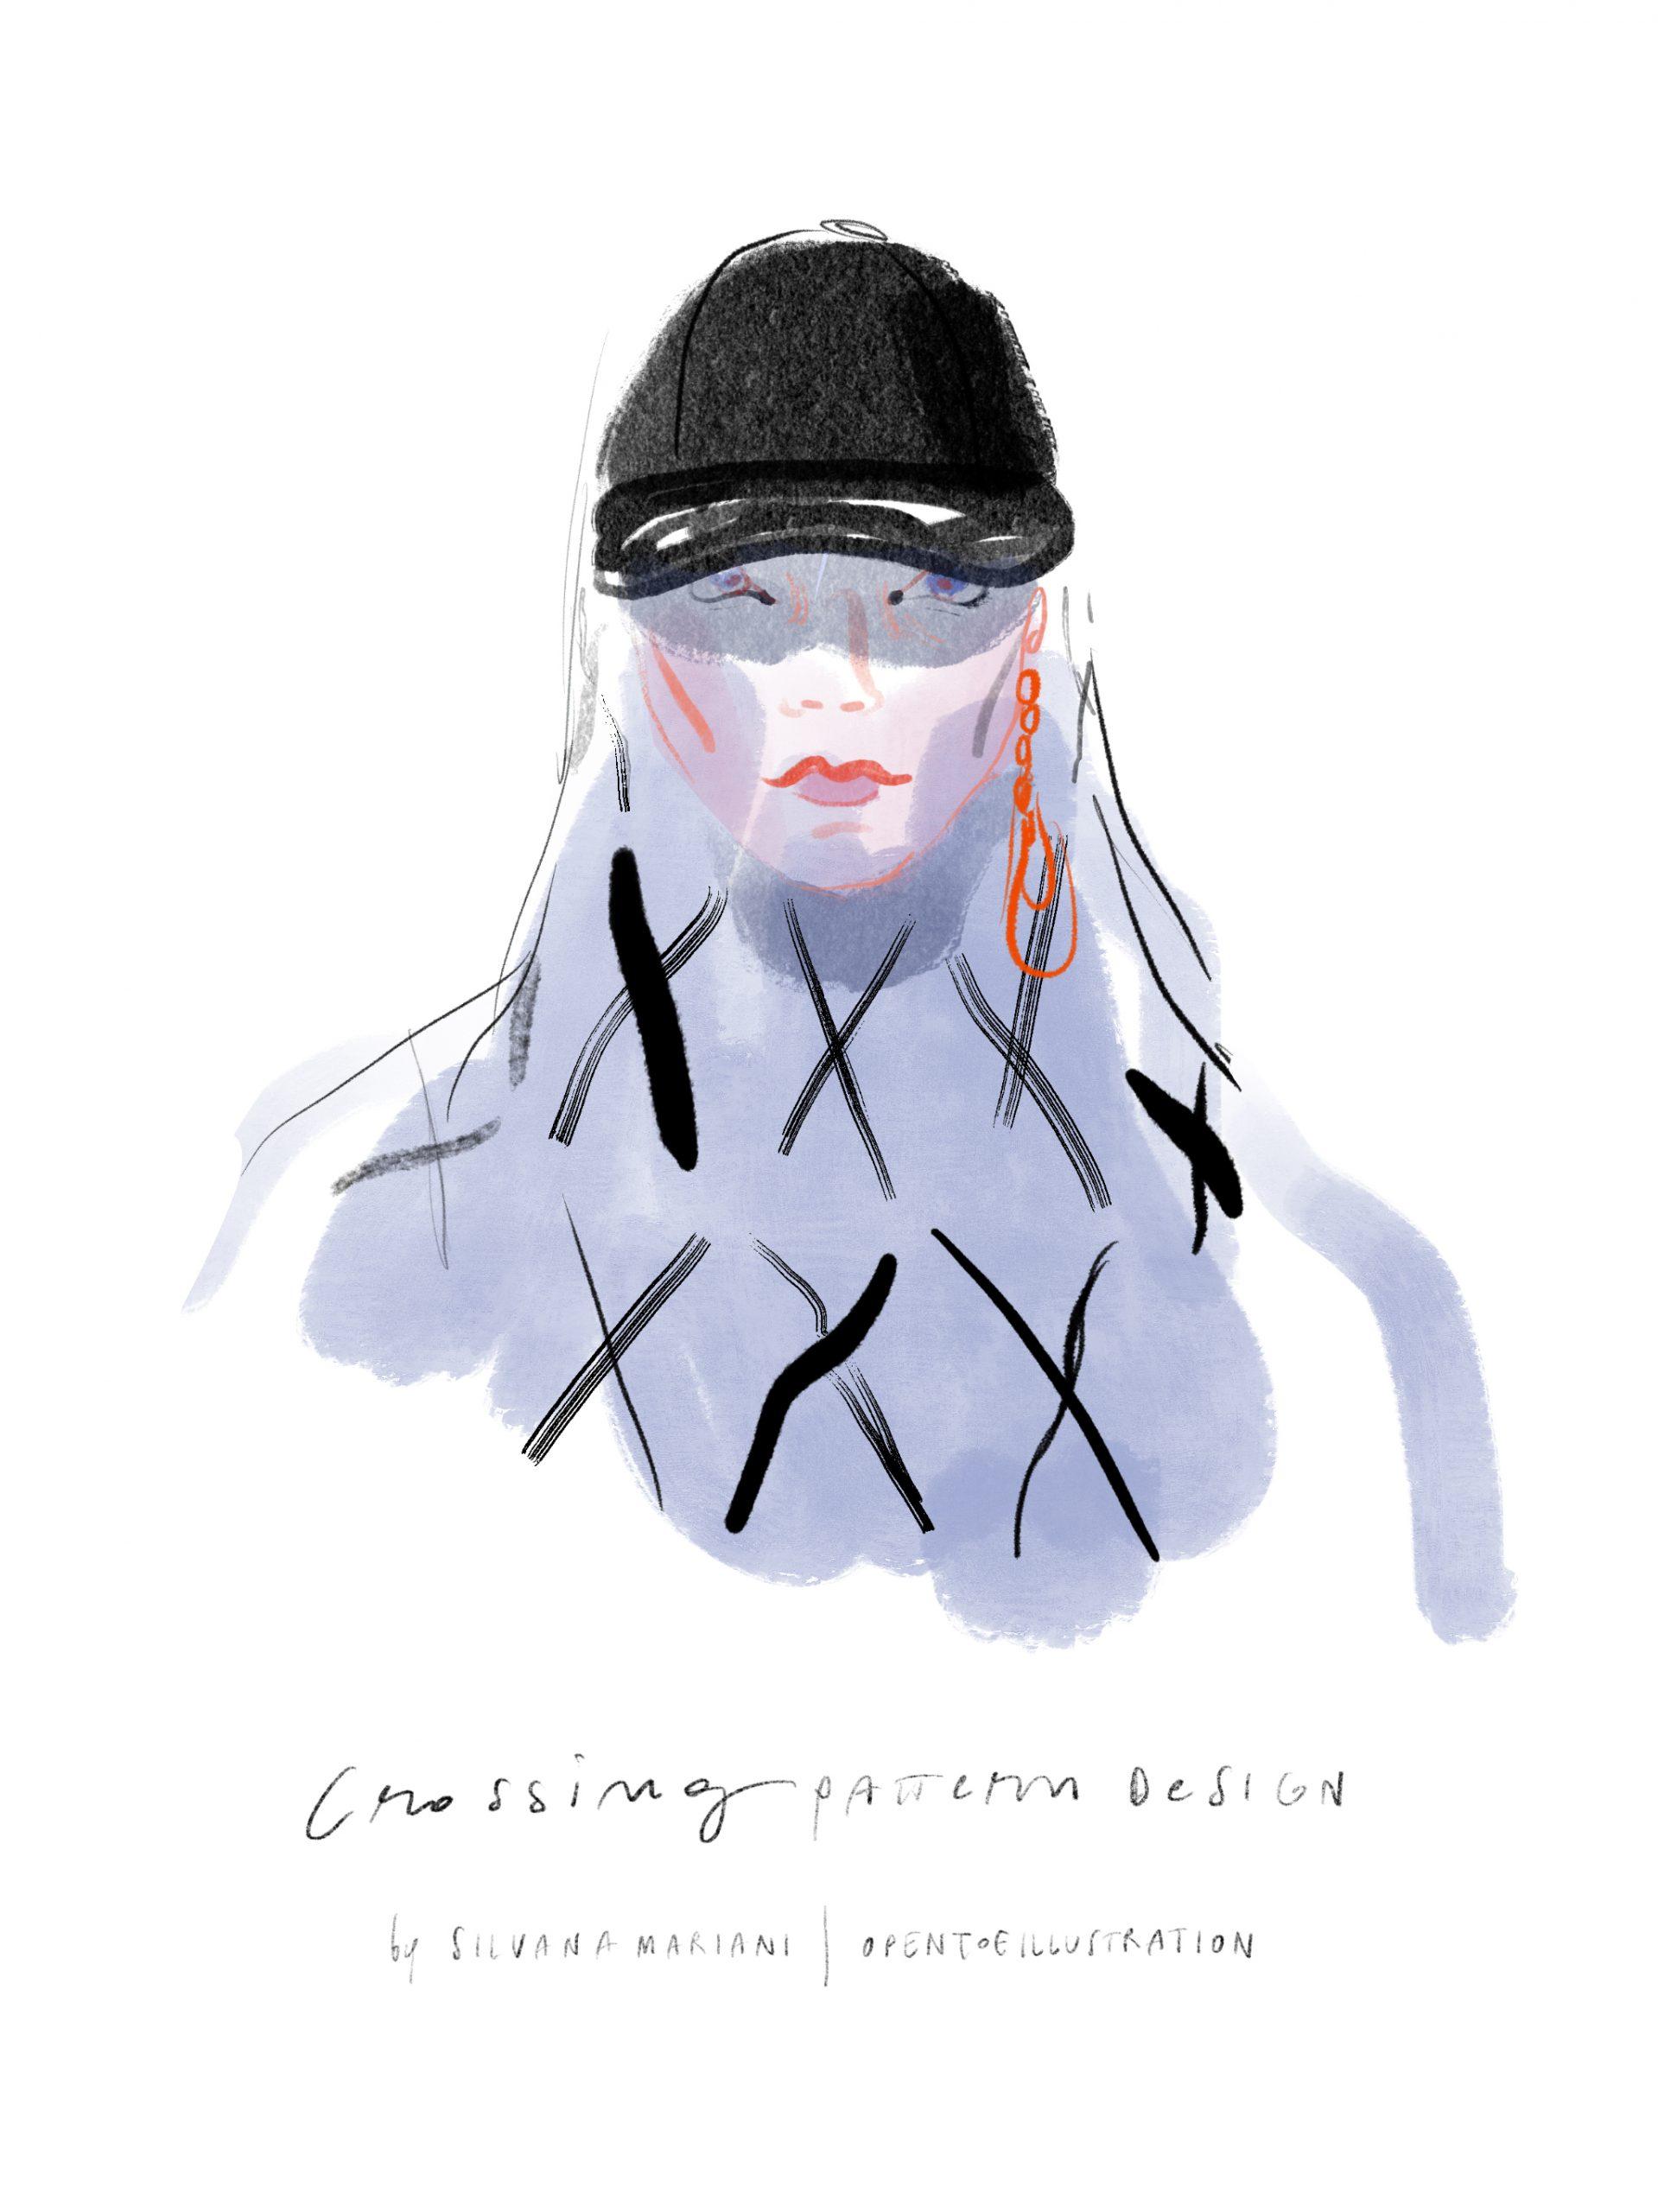 Crossing, fashion illustration by Silvana Mariani